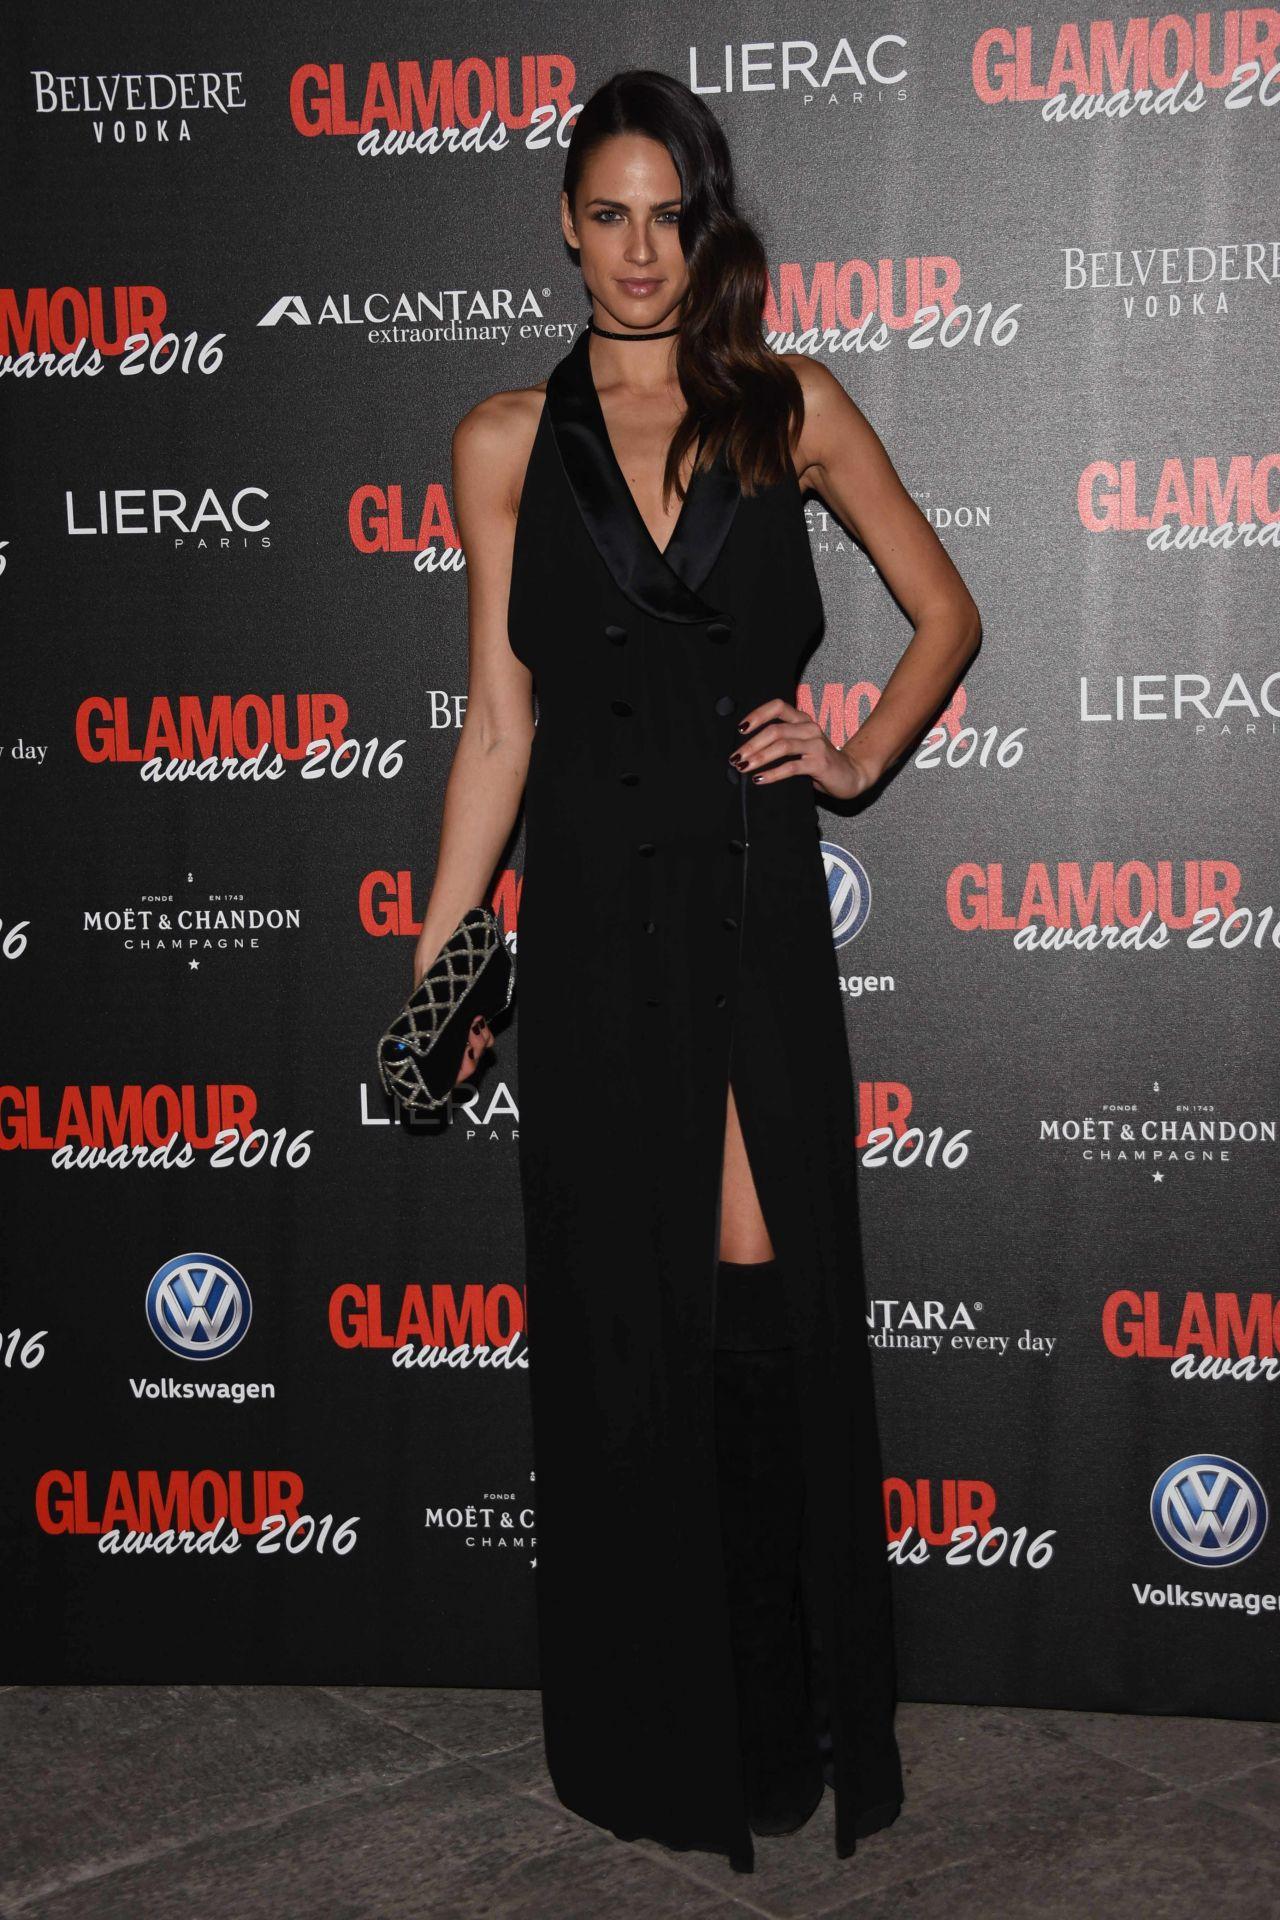 Brina Knauss – Glamour Awards in Milan, December 2016